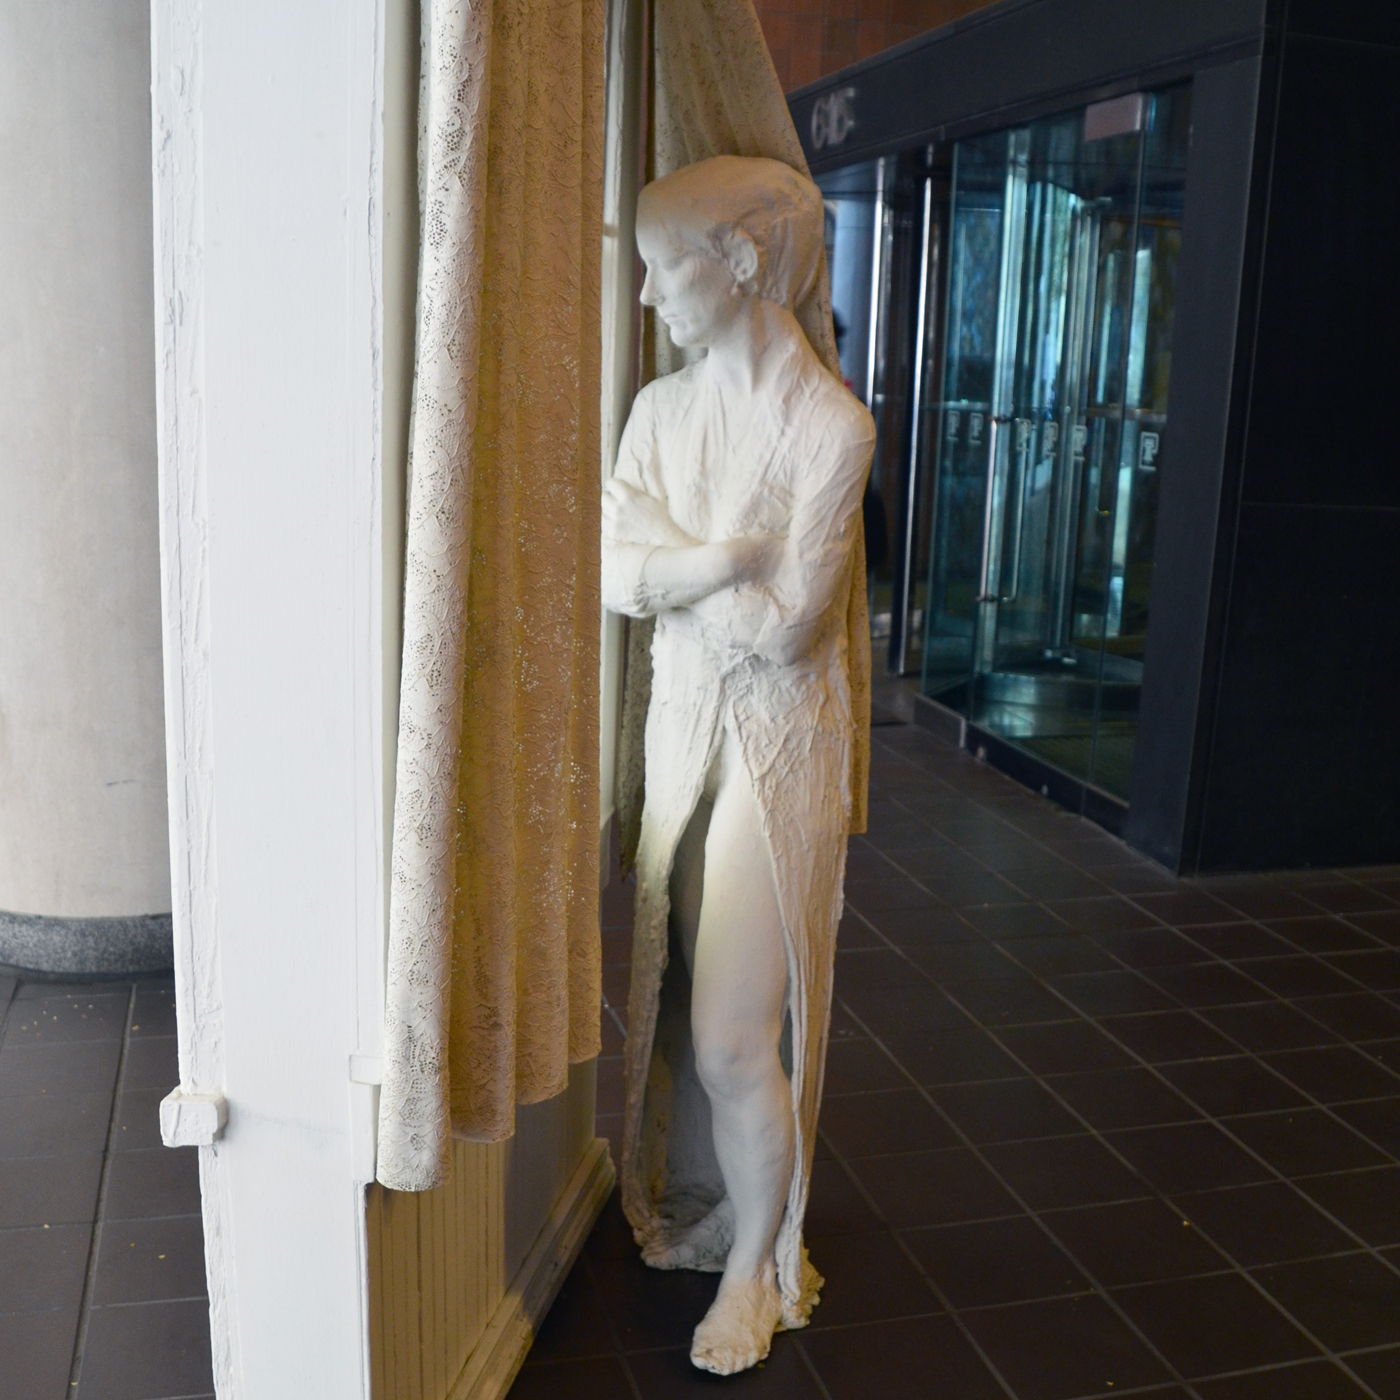 Woman Looking Through a Window - Association for Public Art